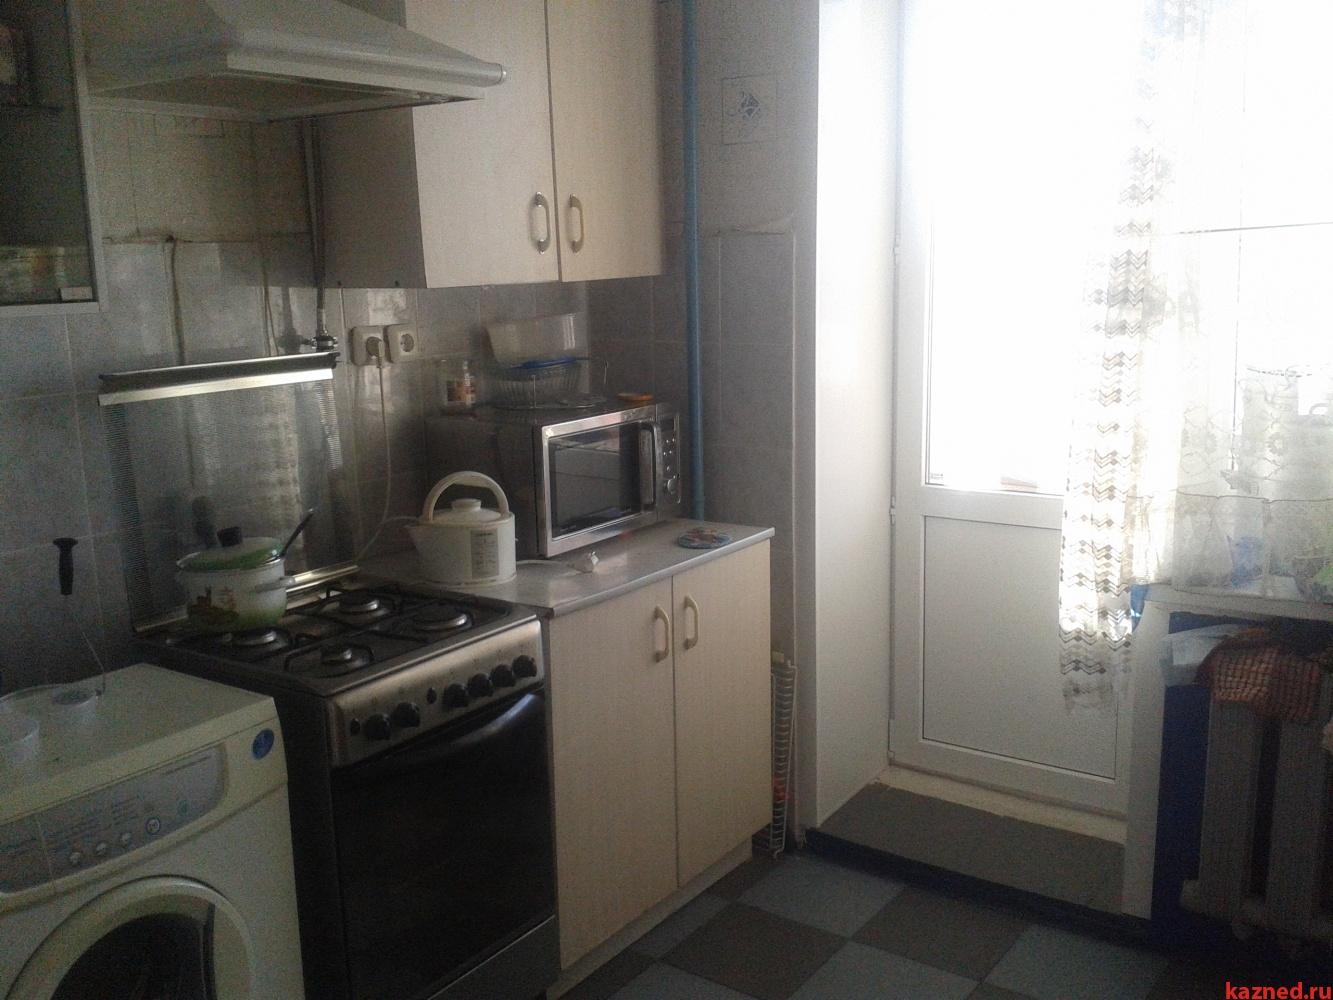 Продажа 1-к квартиры Дубинина, д. 7, 37 м2  (миниатюра №3)